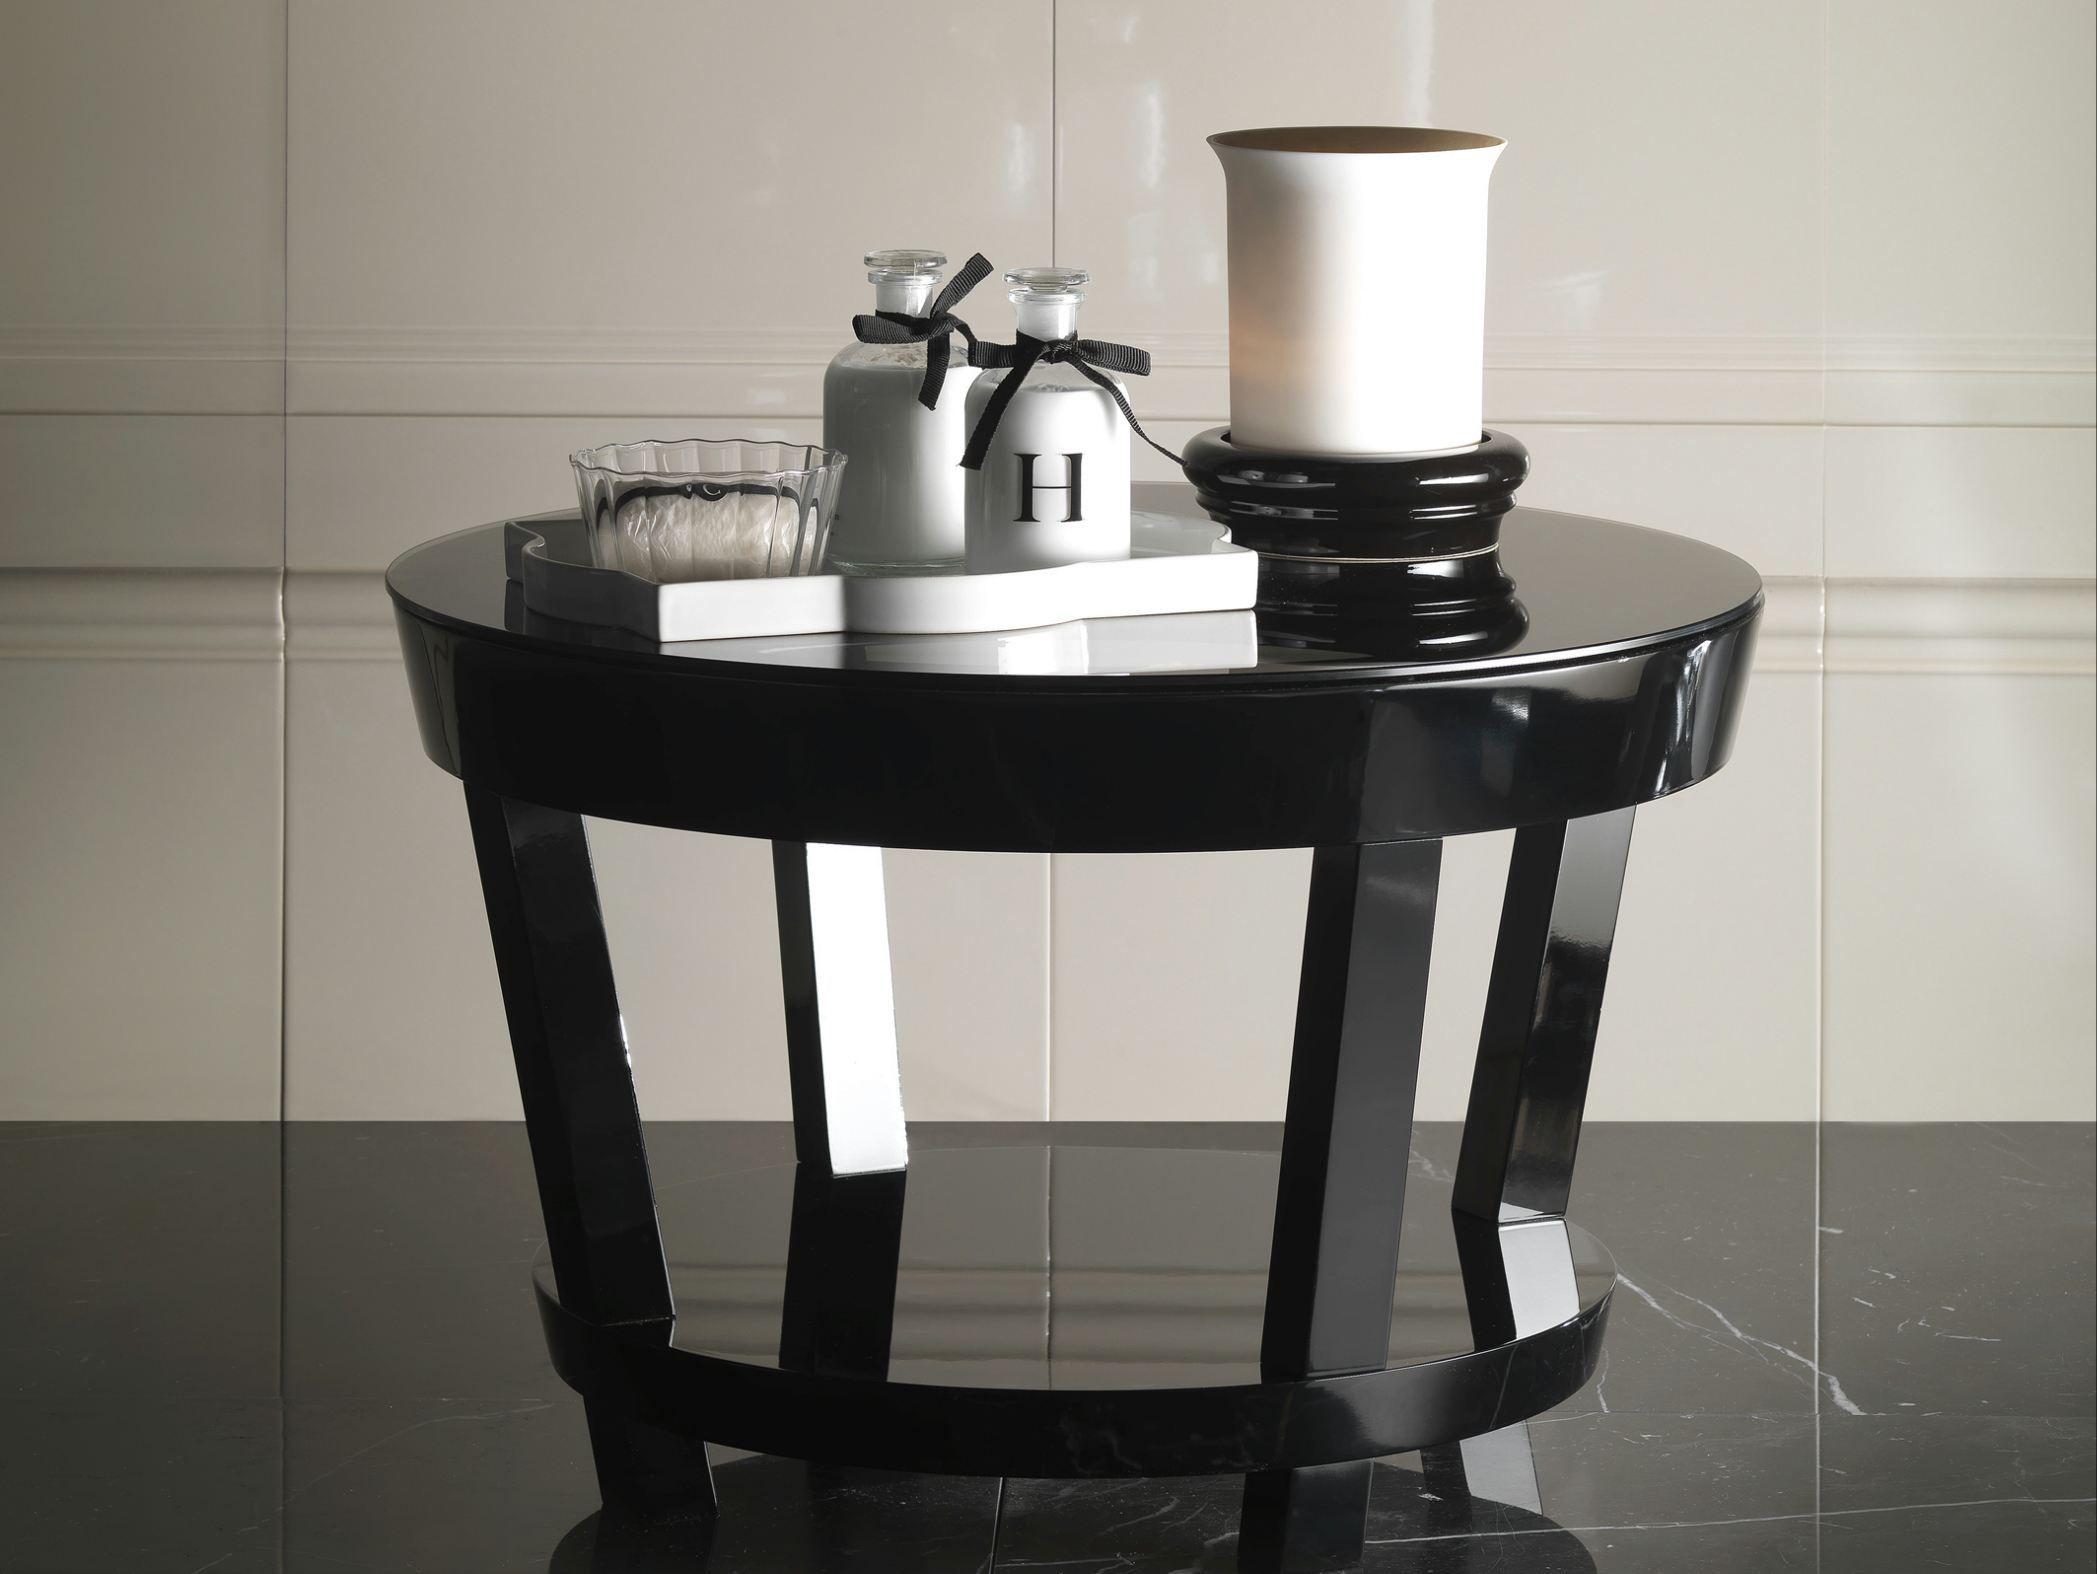 wooden coffee table teatime by devon devon. Black Bedroom Furniture Sets. Home Design Ideas